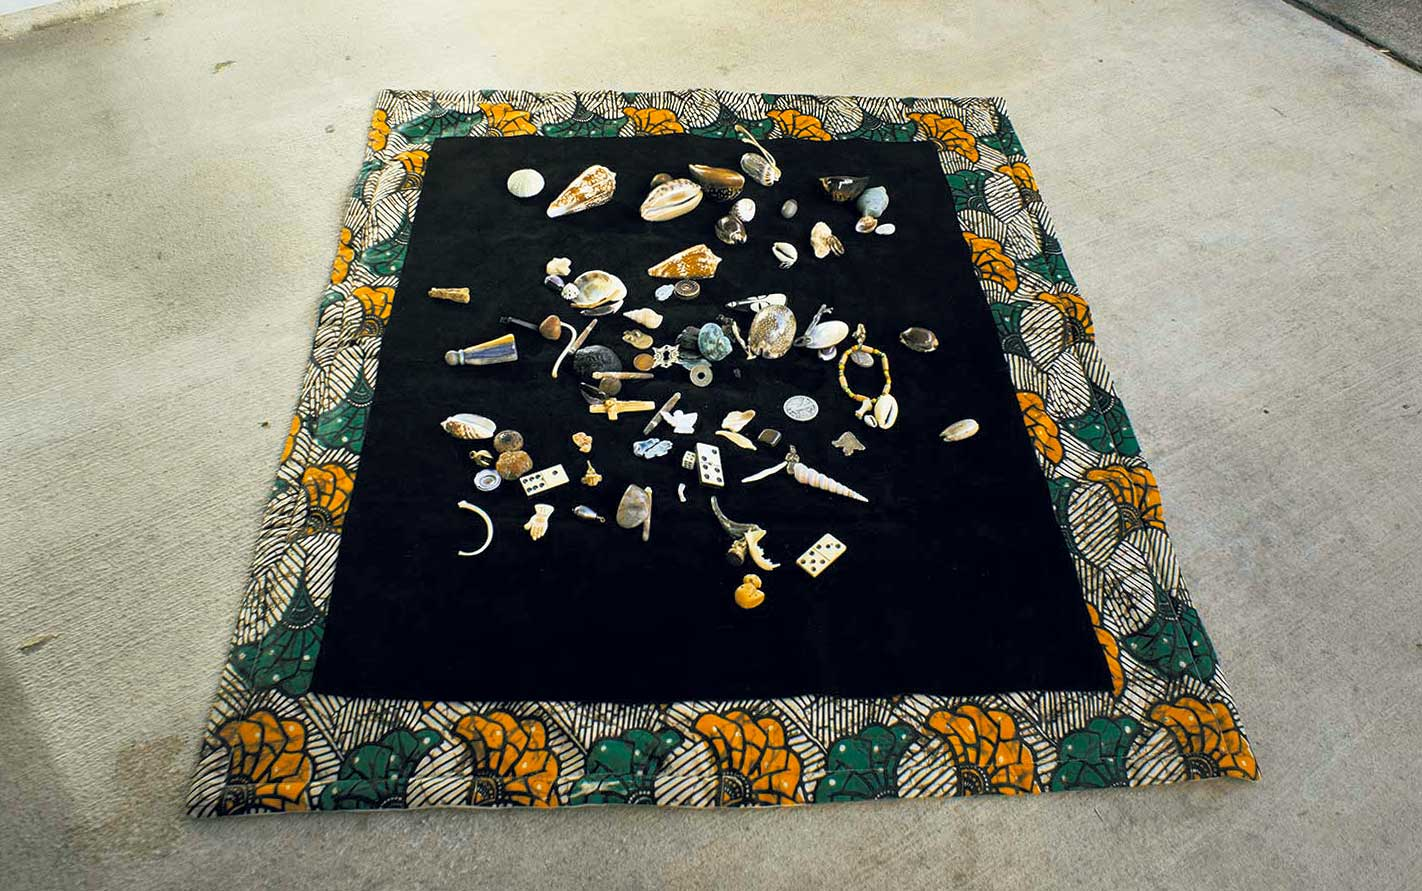 bones-on-cloth-1